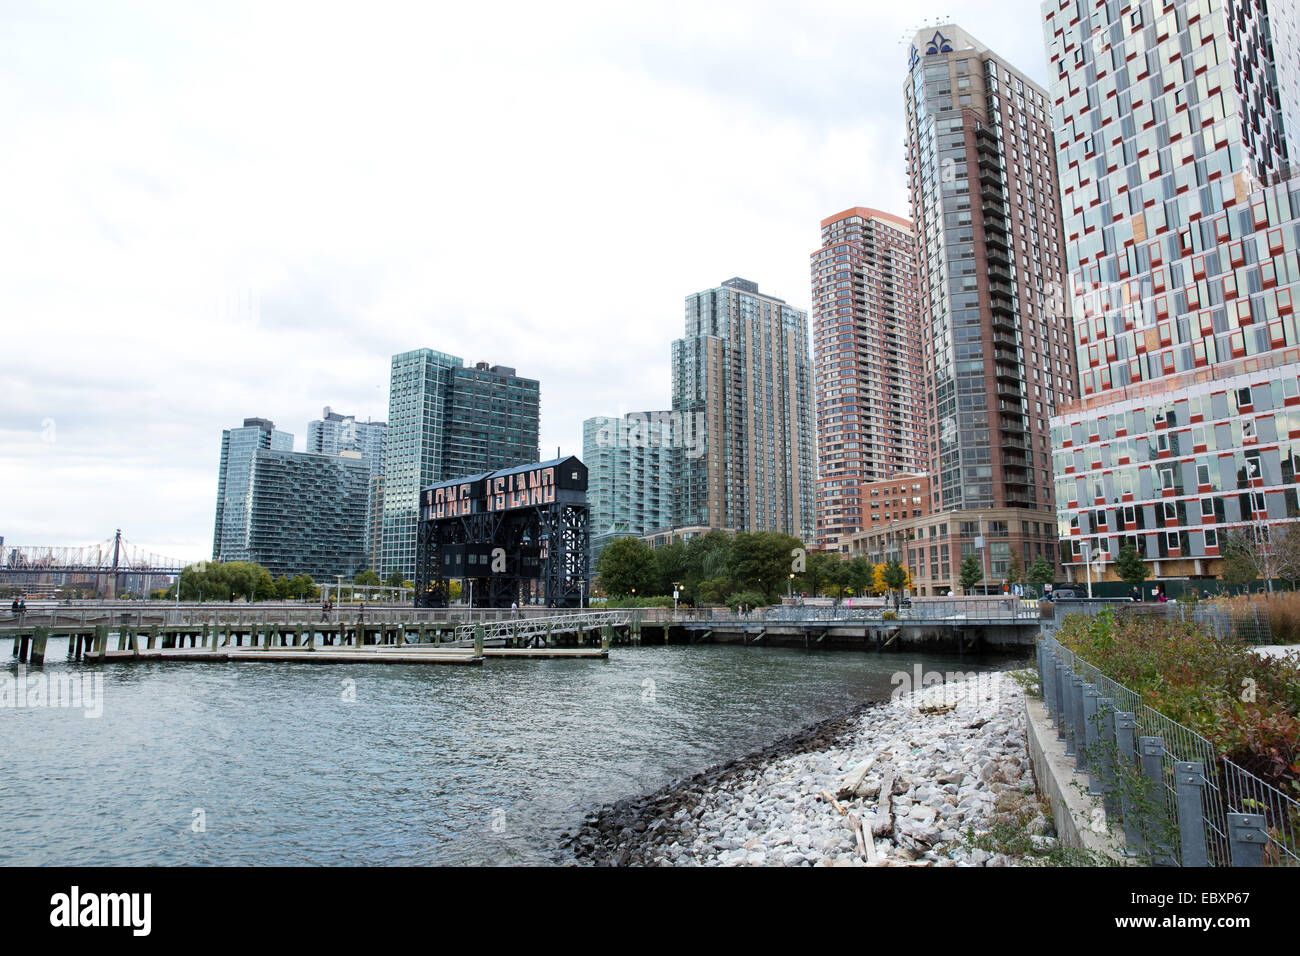 New Build Apartment Buildings Long Island